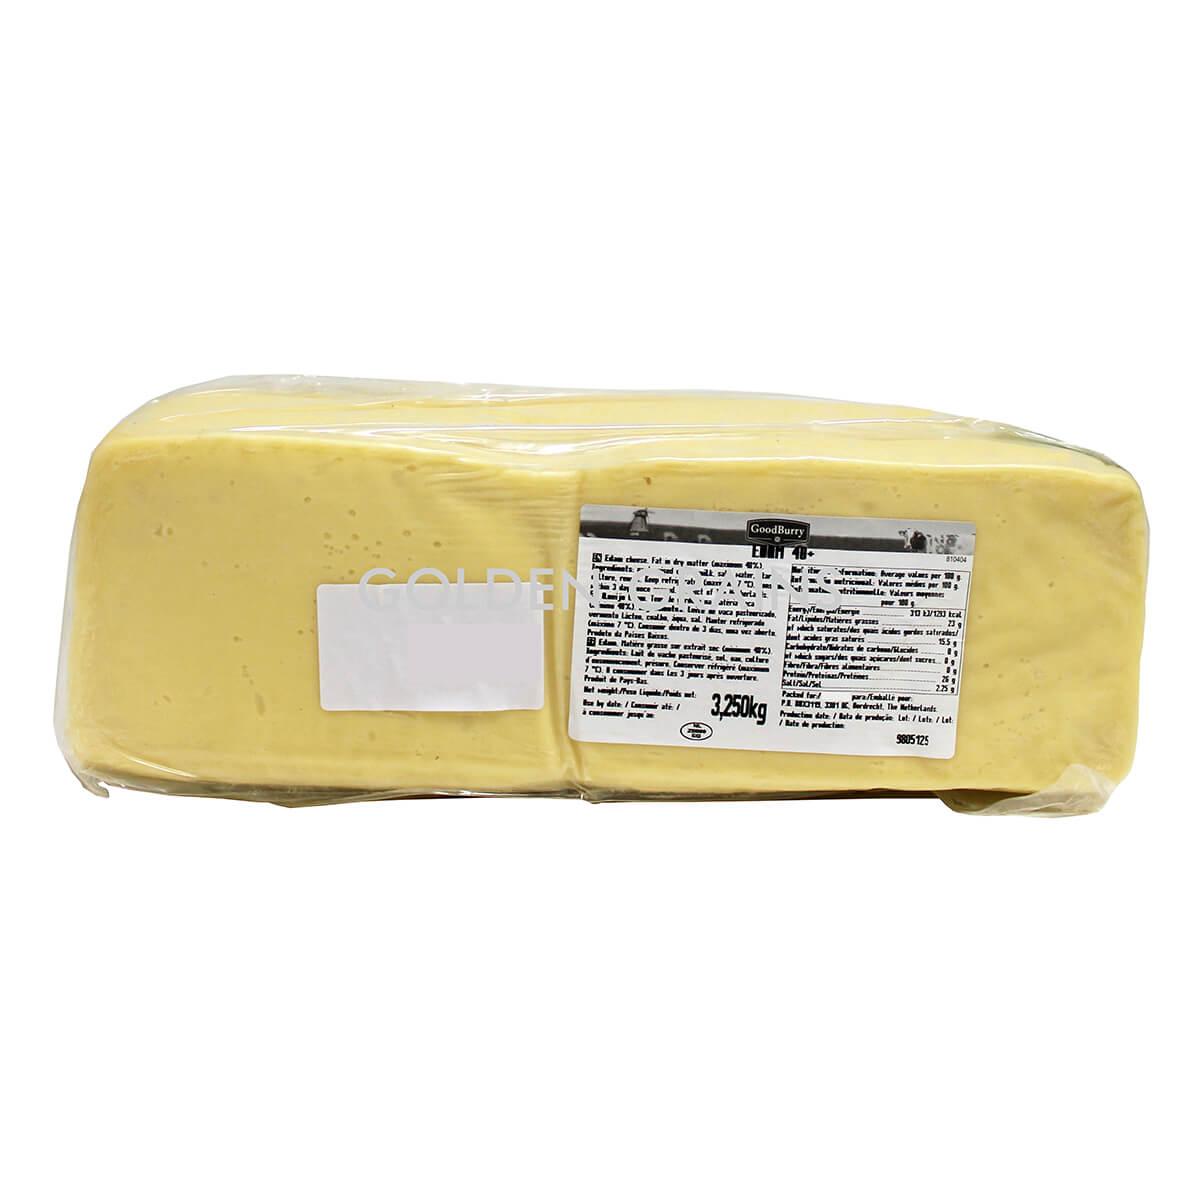 Golden Grains Goodbury - Edam Cheese - Front.jpg